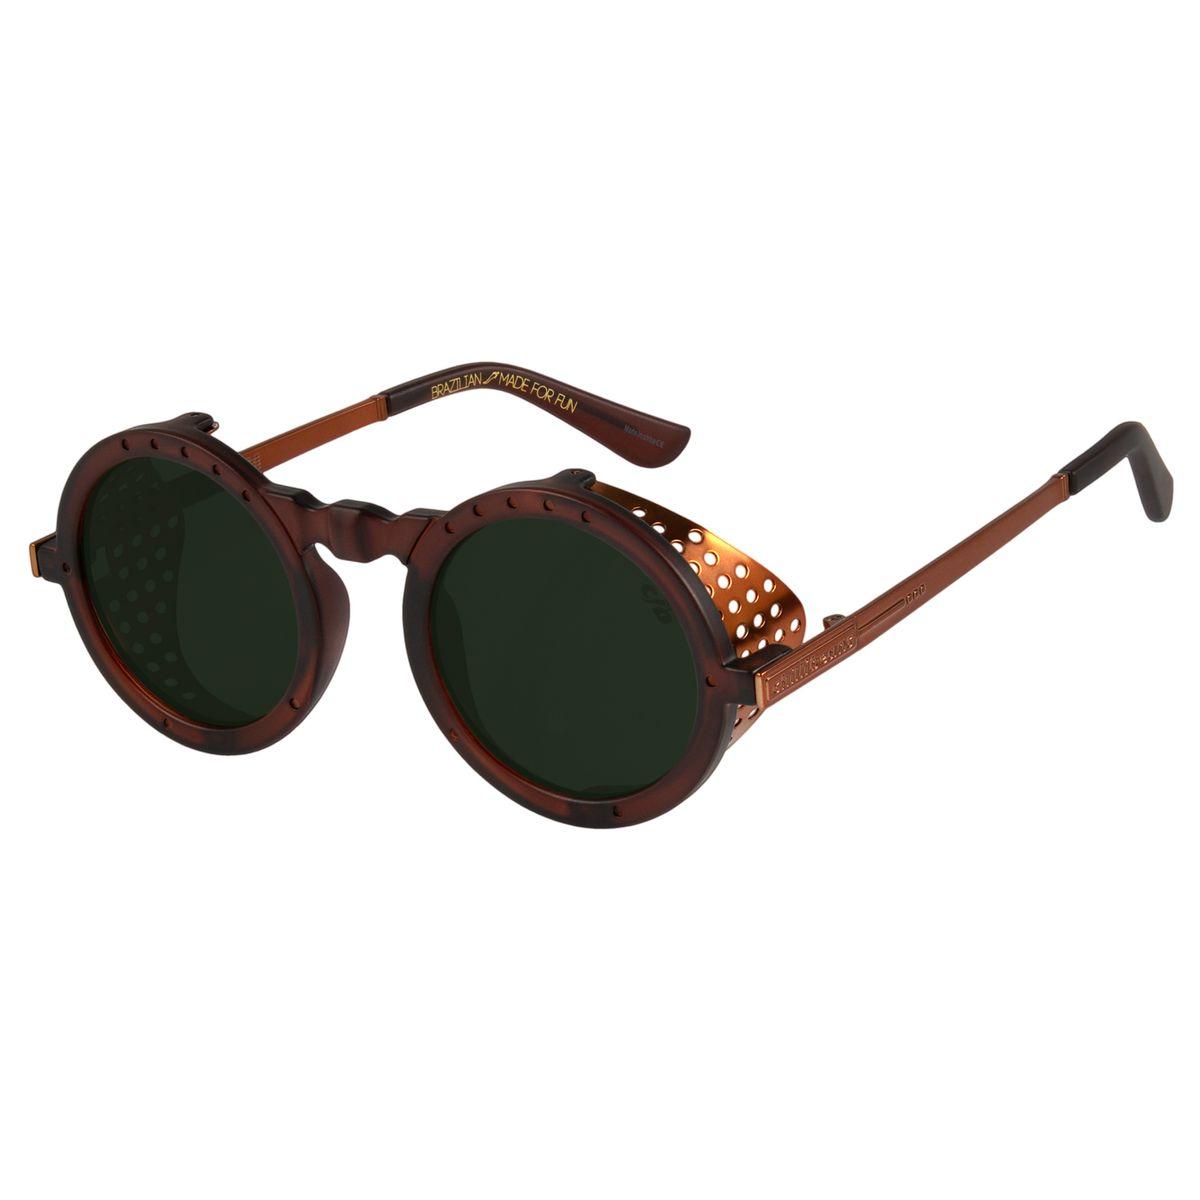 63c1136c9 Óculos de Sol Infantil Alok Marrom 2557 - Chilli Beans